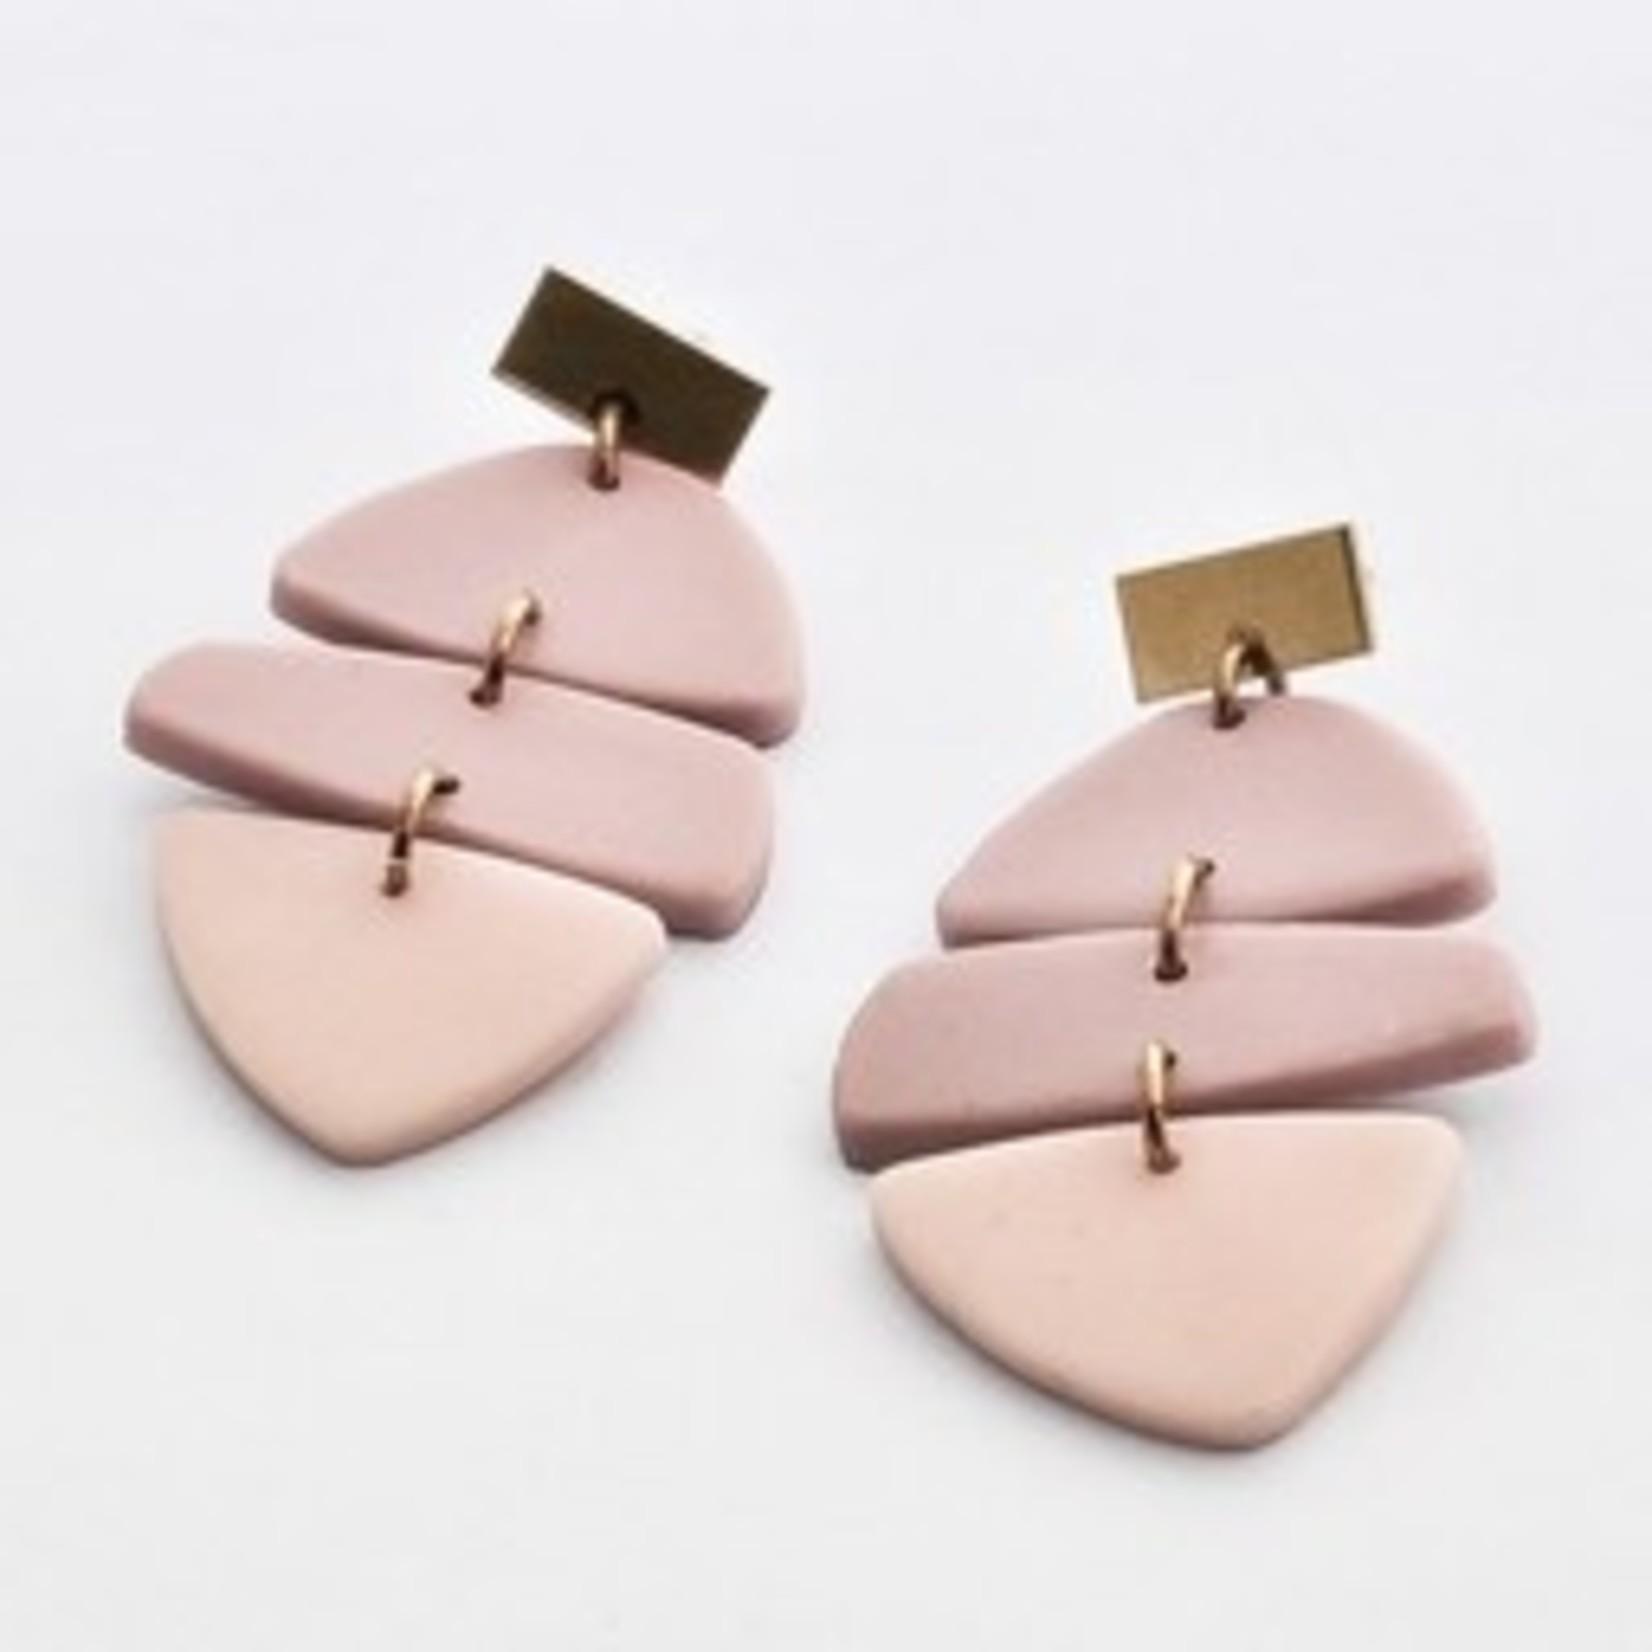 Oorbellen Tinted Triple (Pink mix) - Inimini Homemade